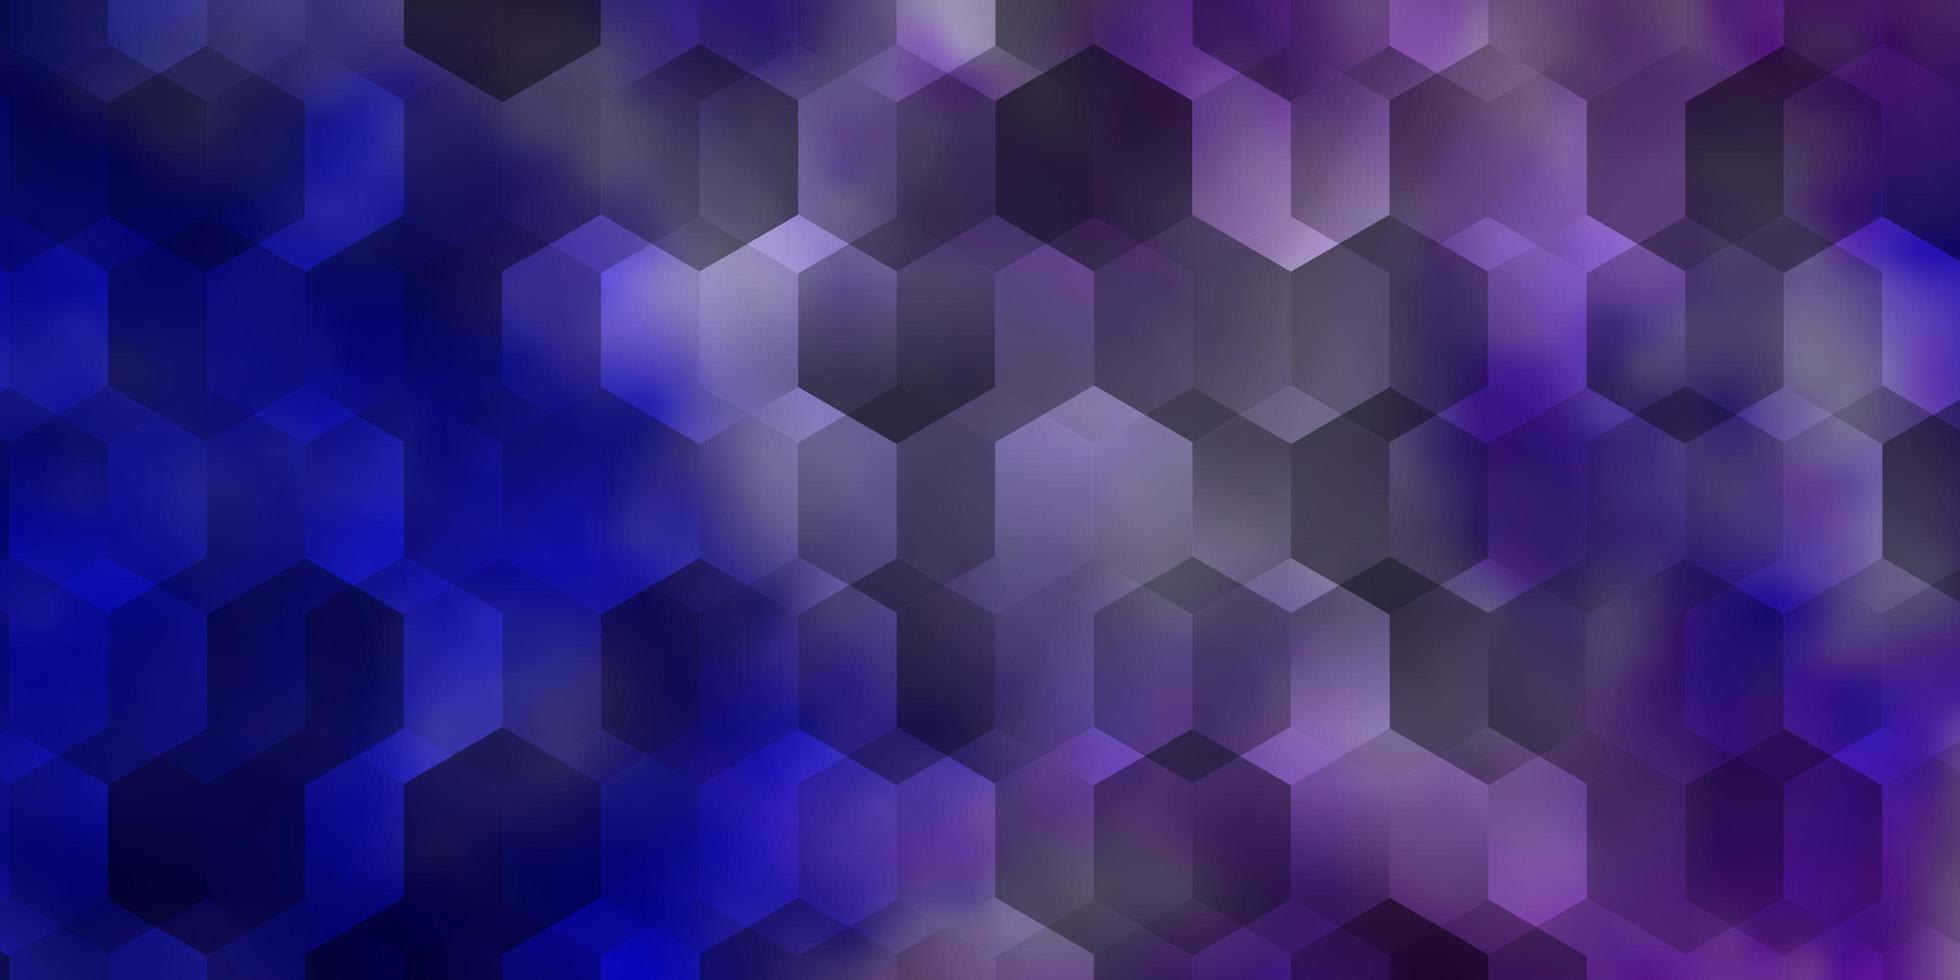 fundo vector rosa claro, azul com hexágonos.